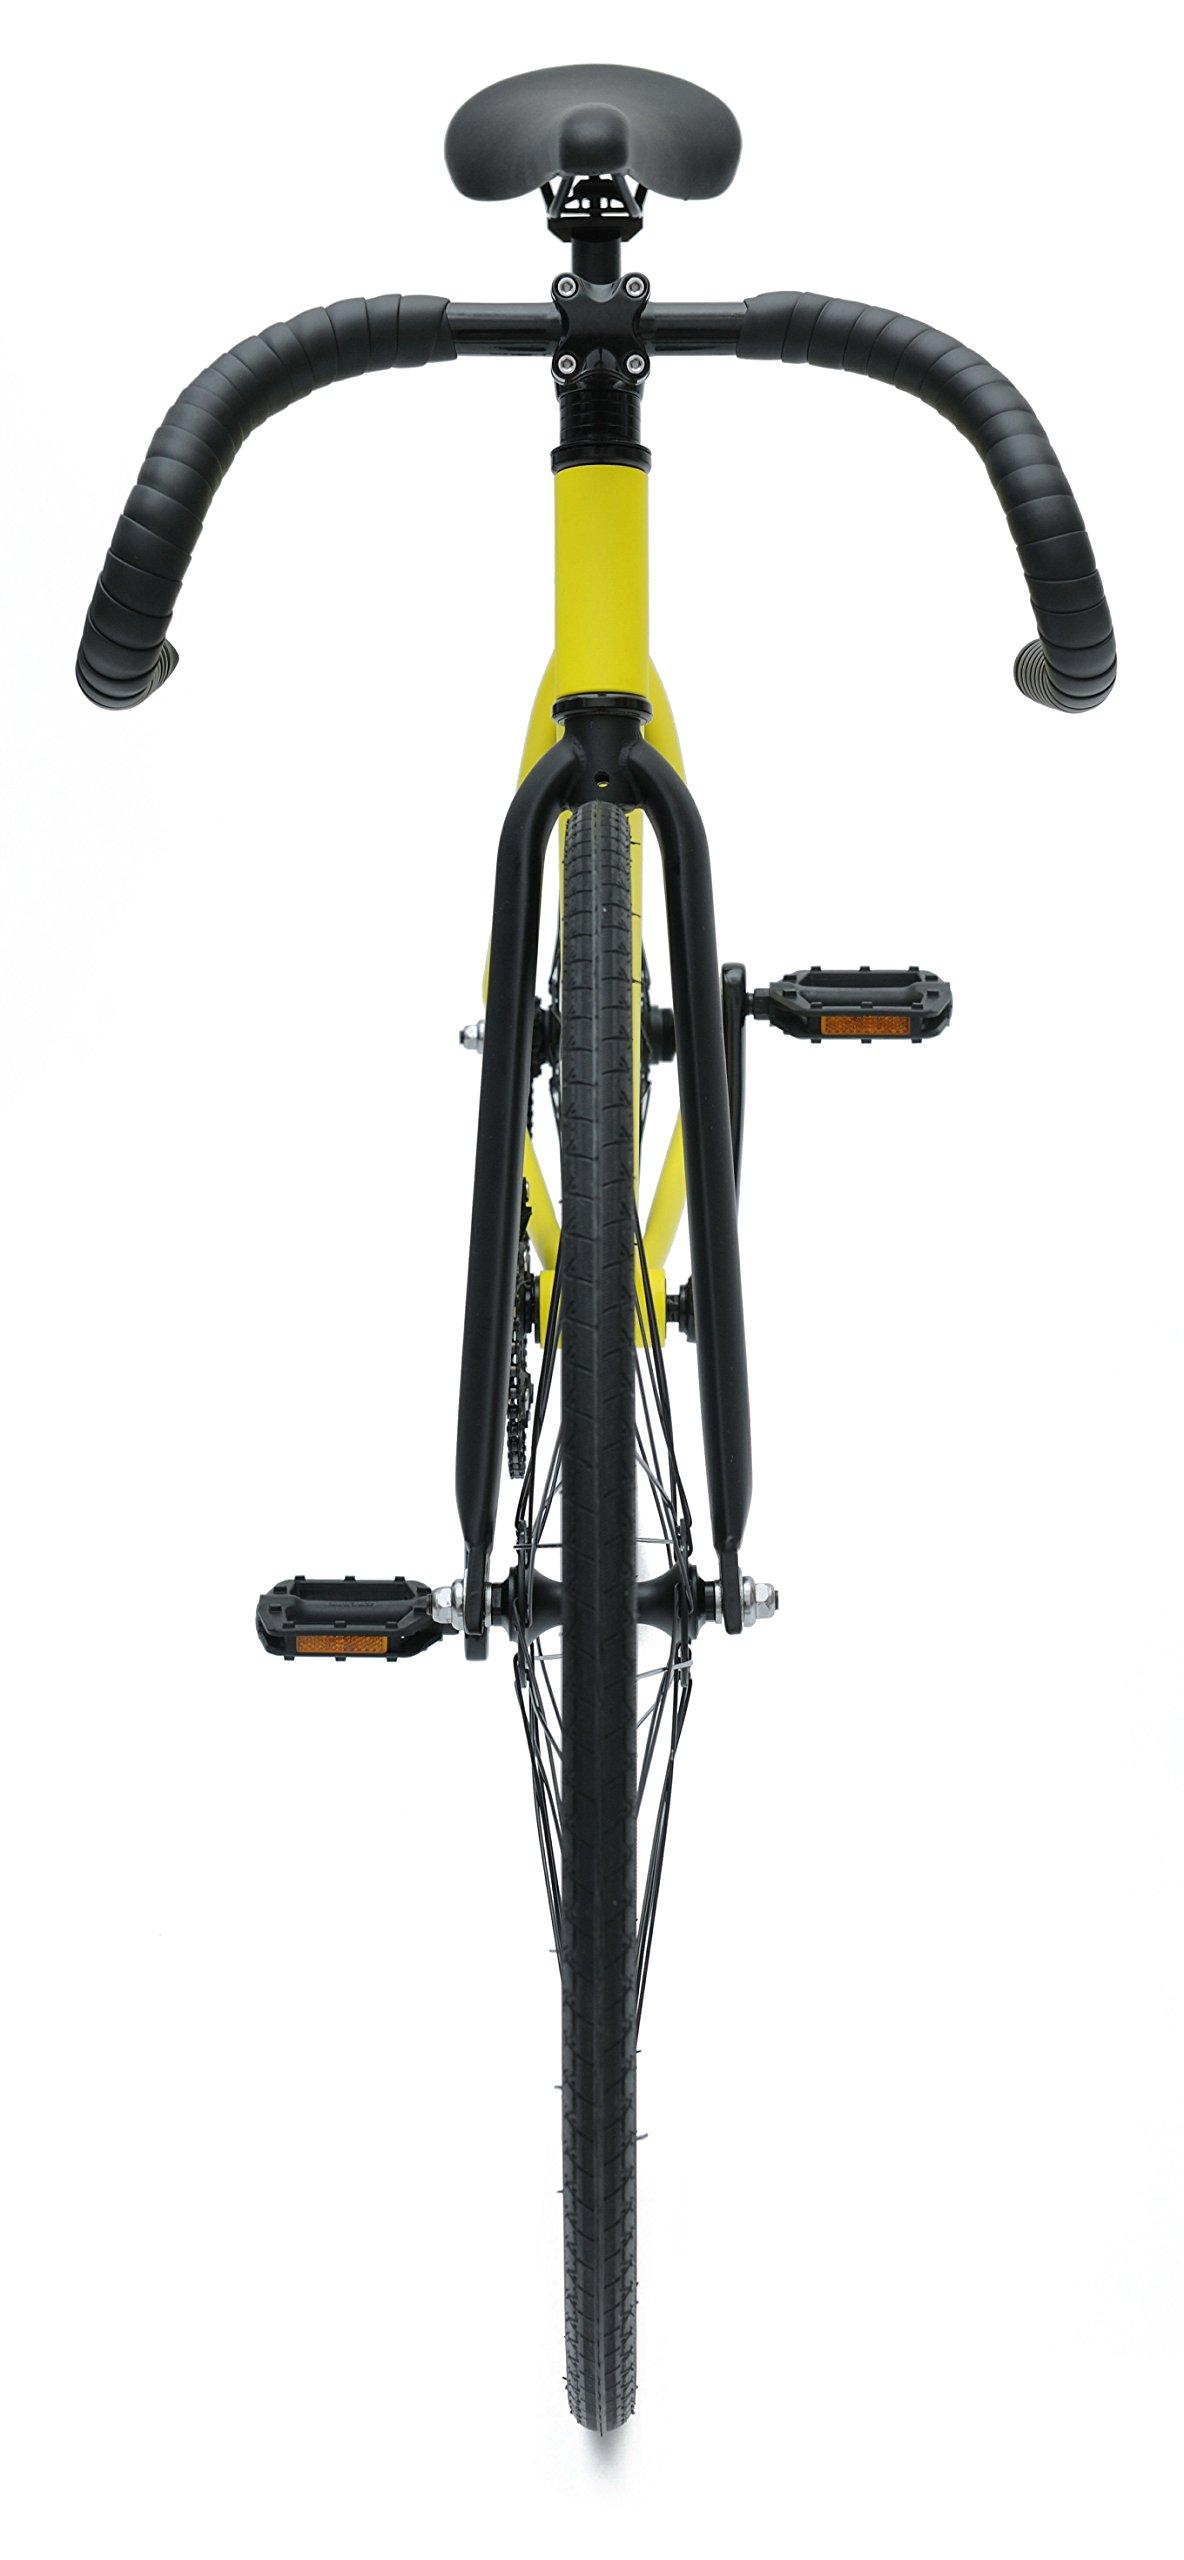 2Pcs Bar End Plugs Aluminum Handlebar End Caps Inserts for MTB Road Bikes